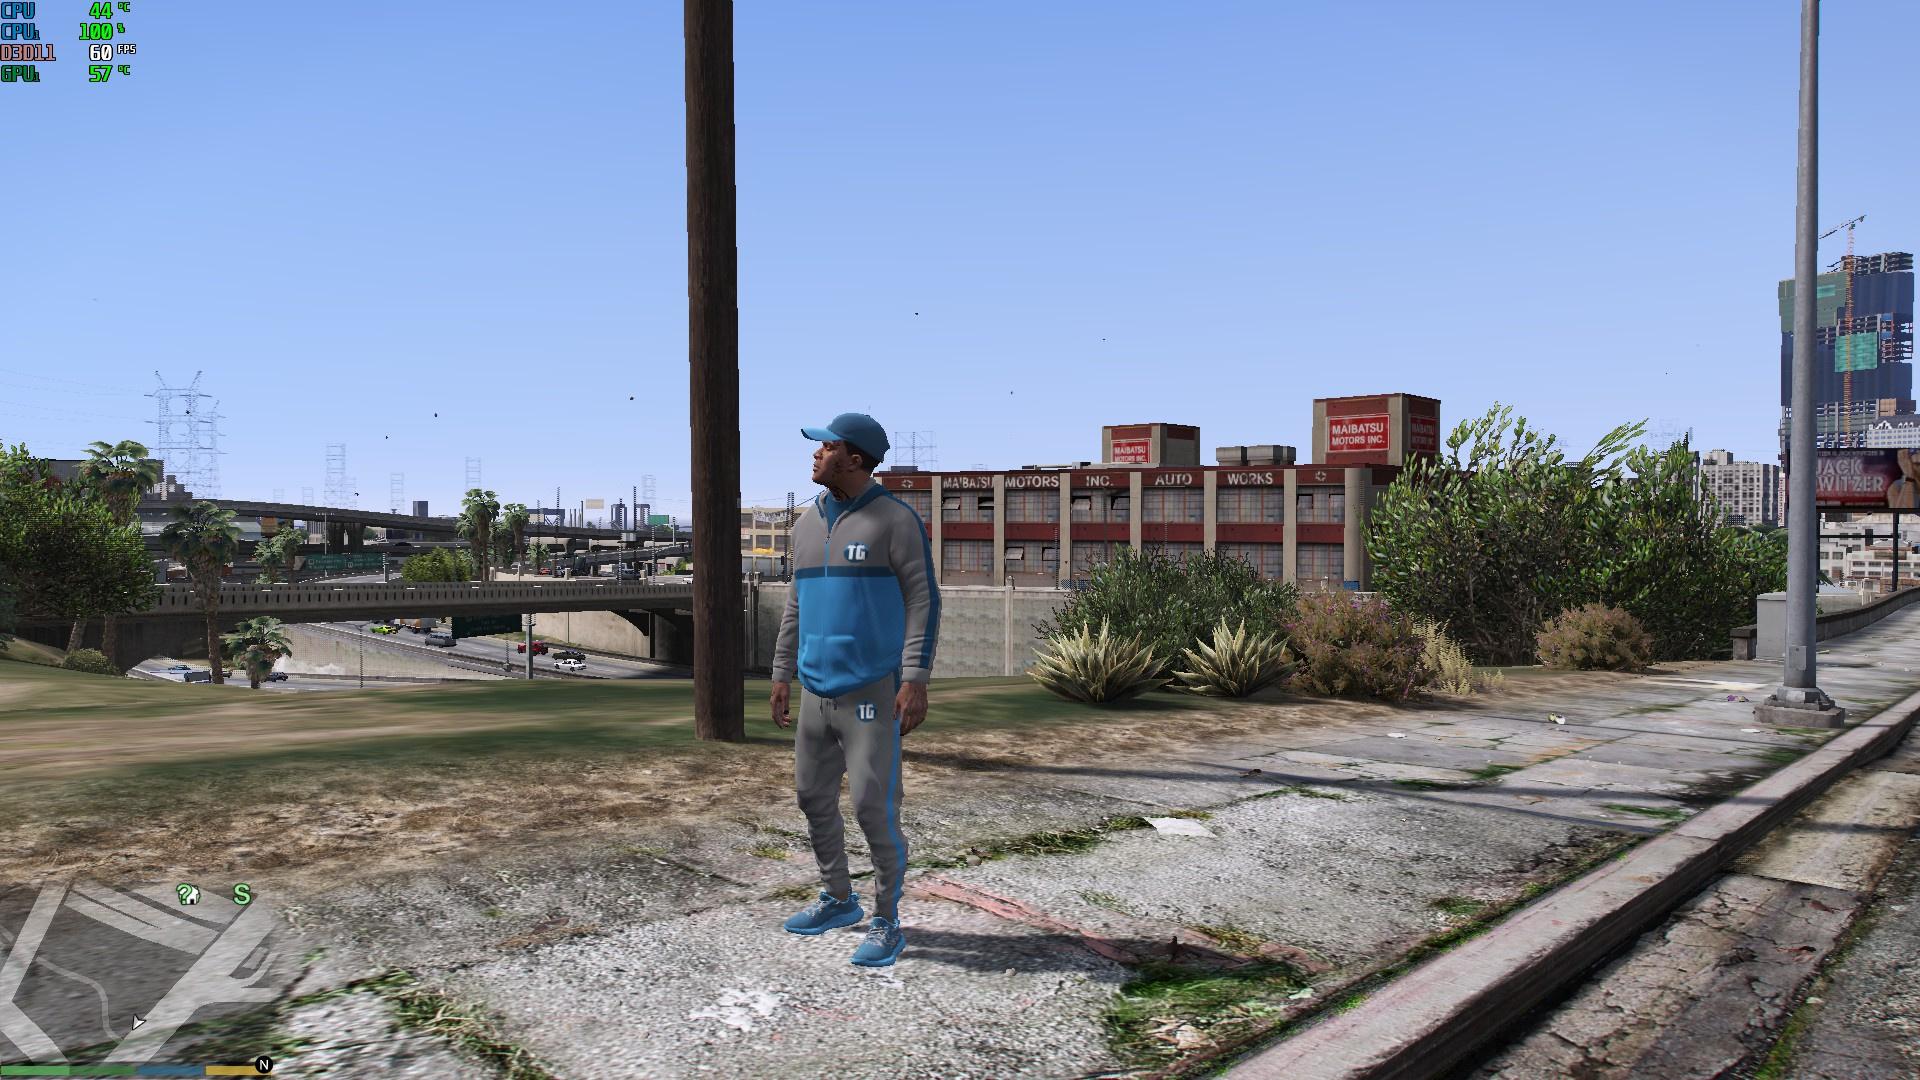 Real Life Thug Mod Tracksuits for Typical Gamer - GTA5-Mods com